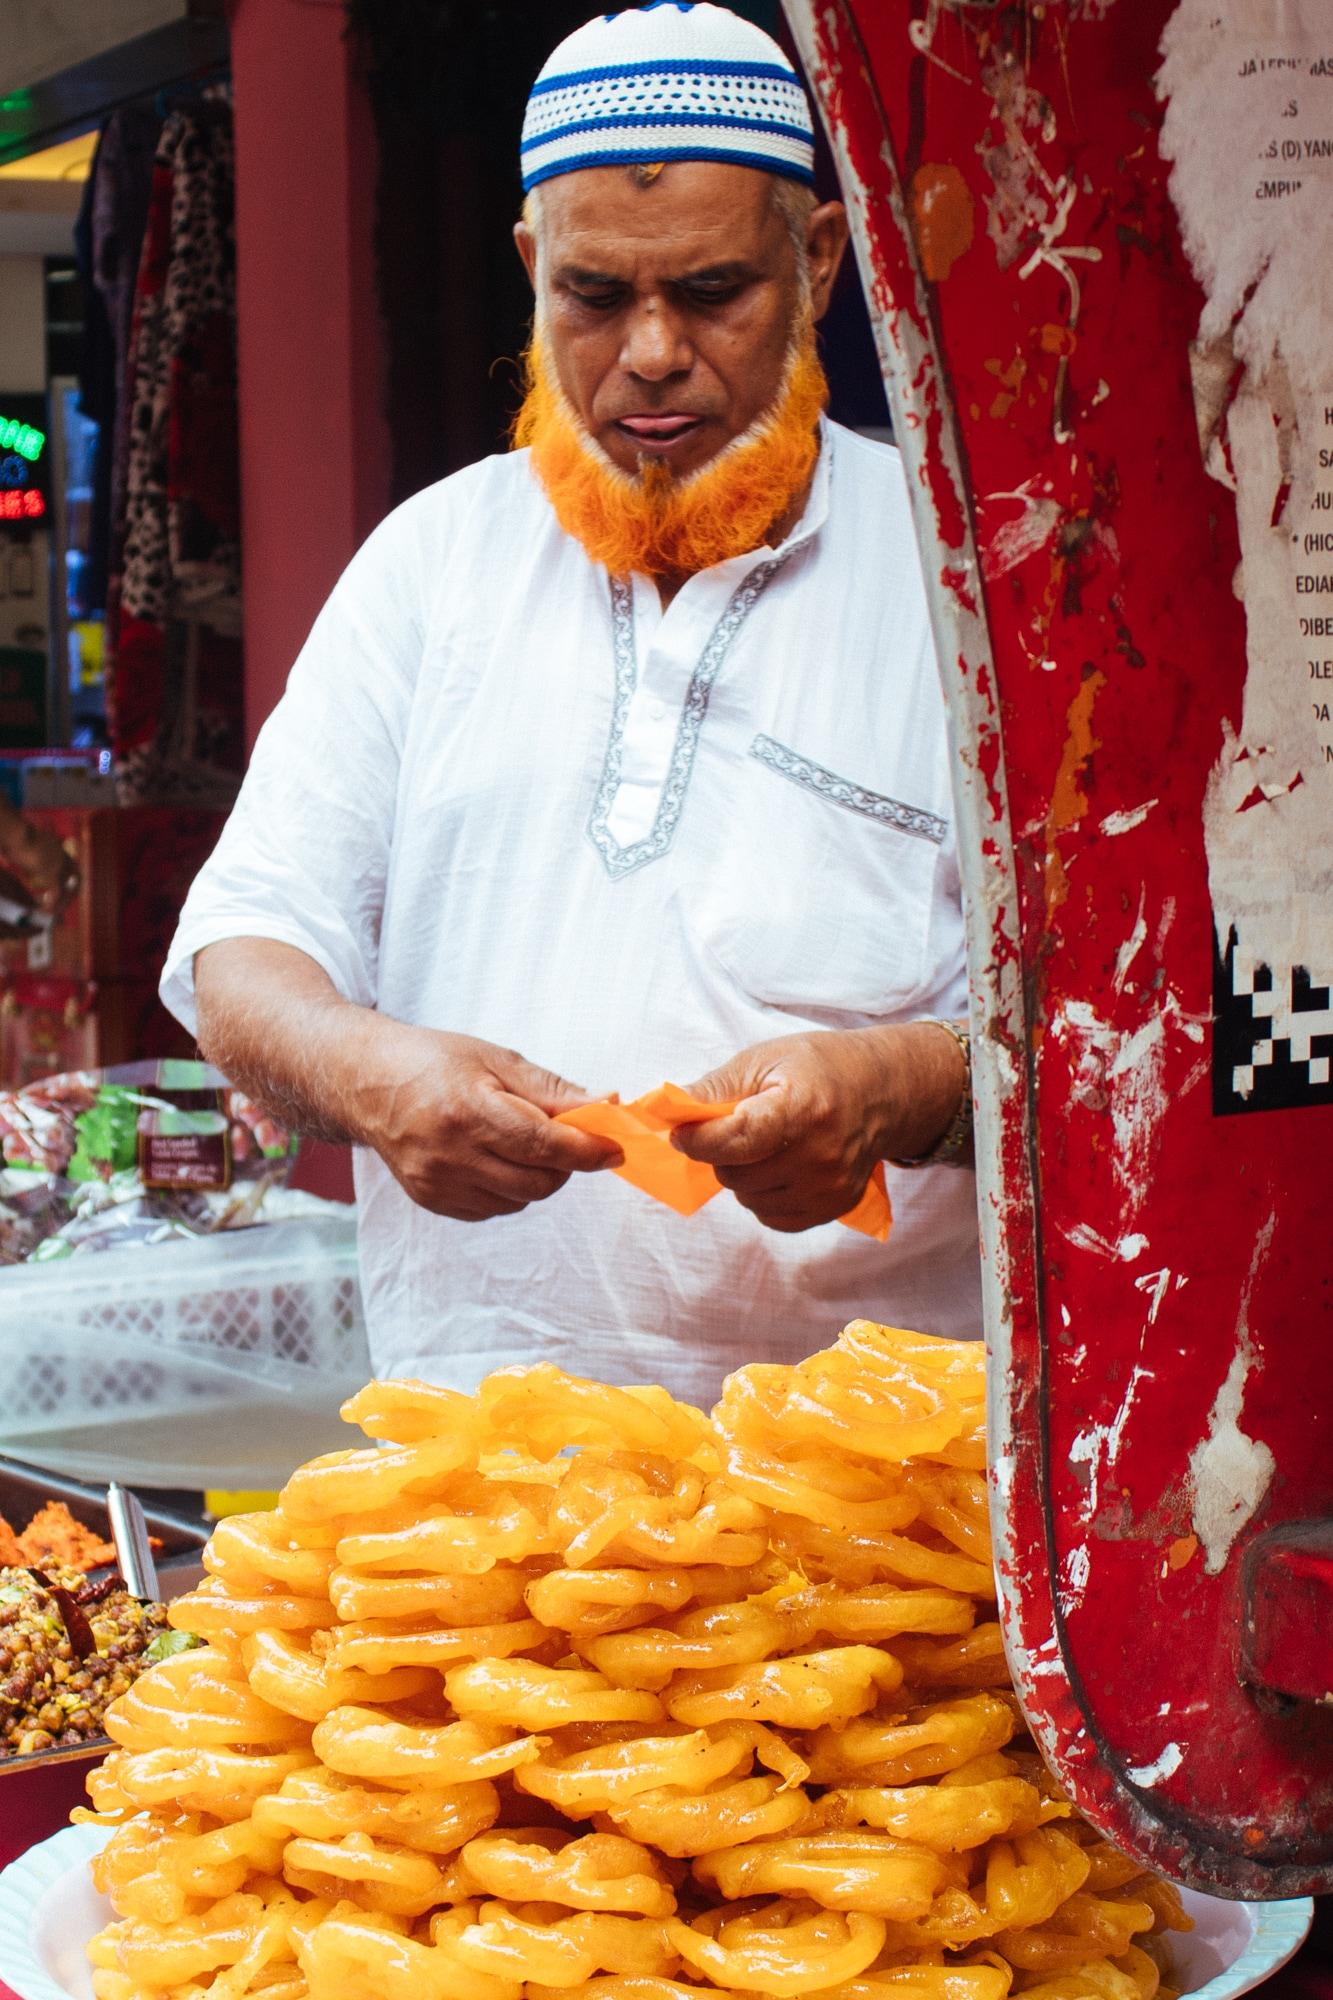 A man selling street food during Ramdan